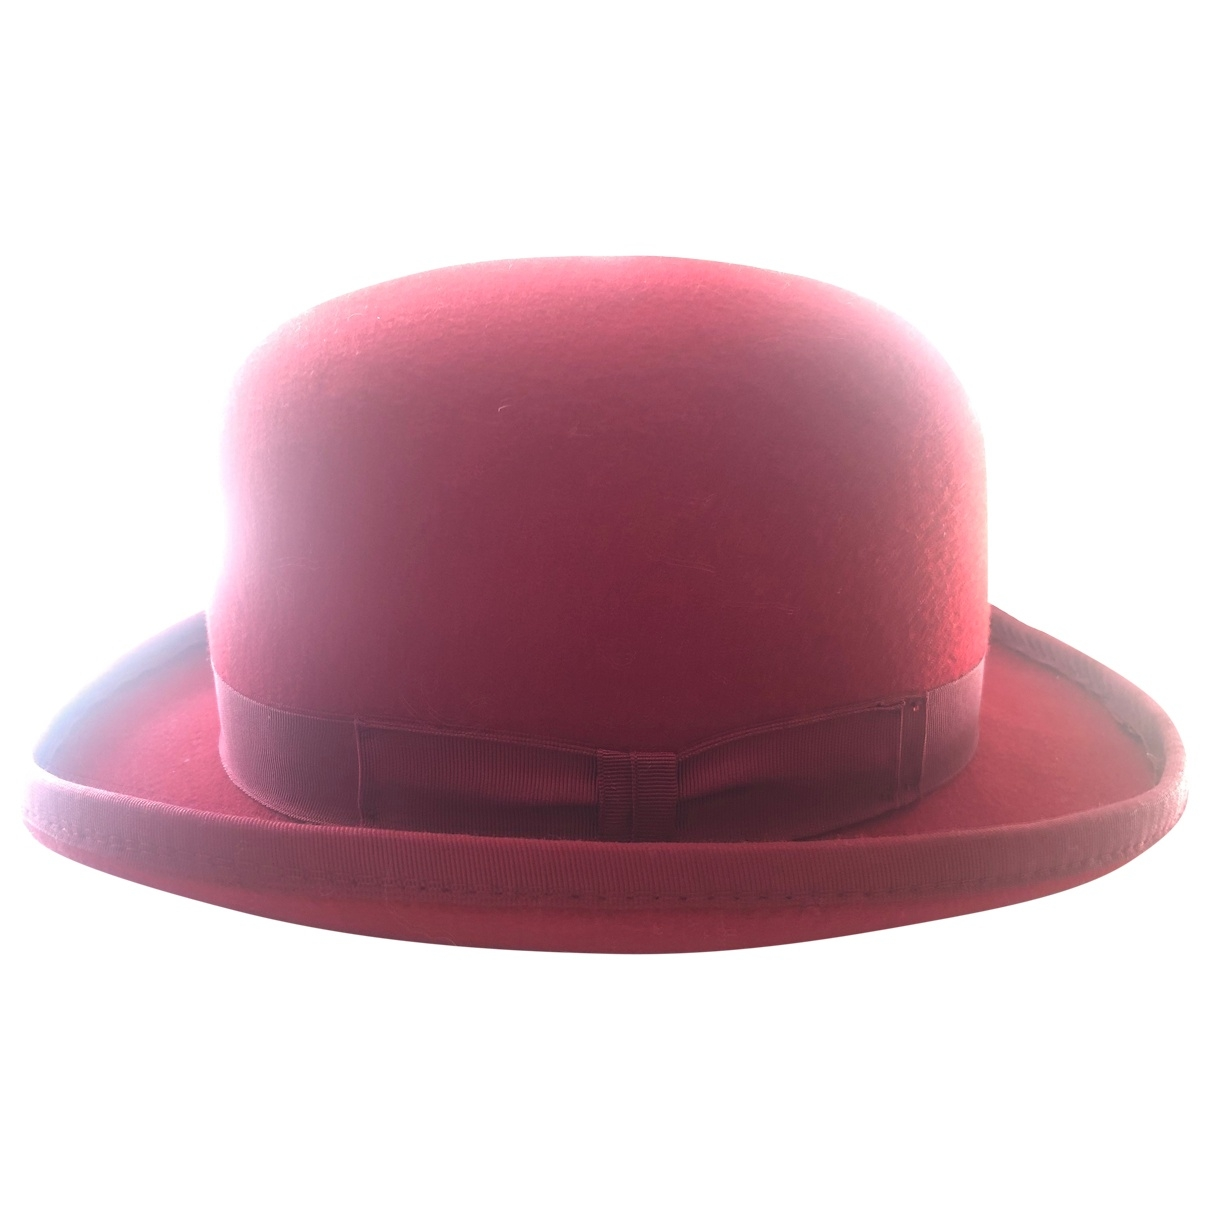 Christy's \N Red Wool hat for Women M International